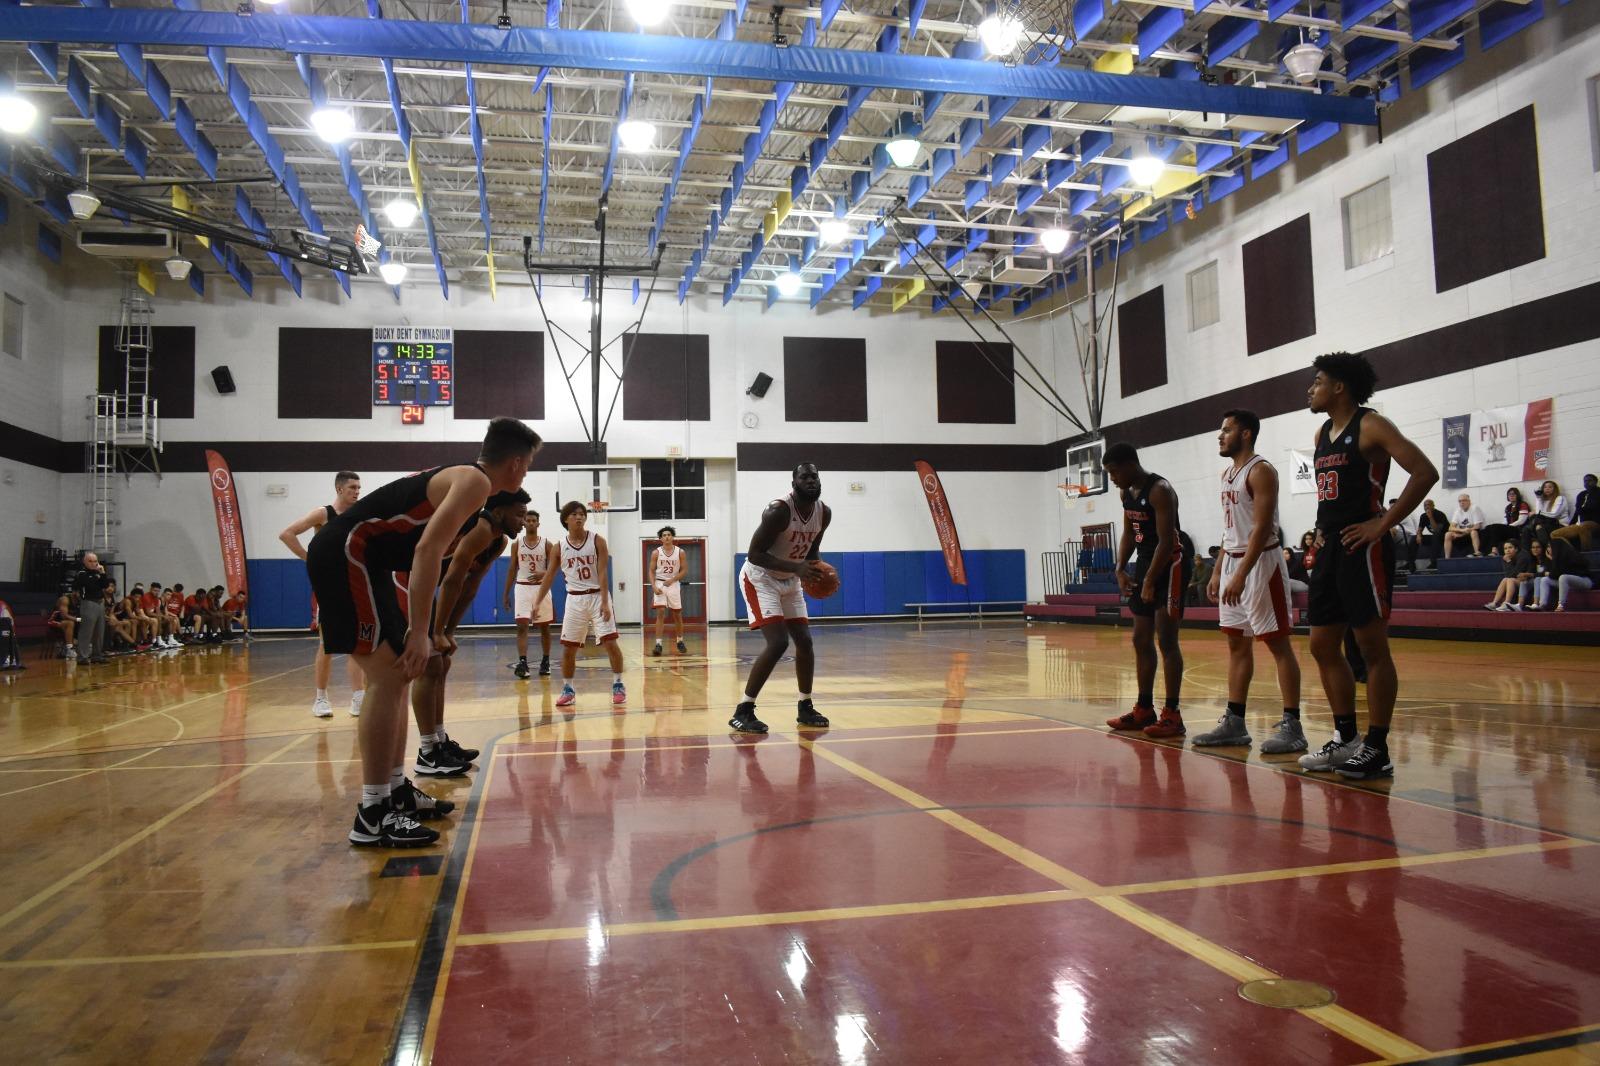 Men's basketball player Denzel shooting the ball